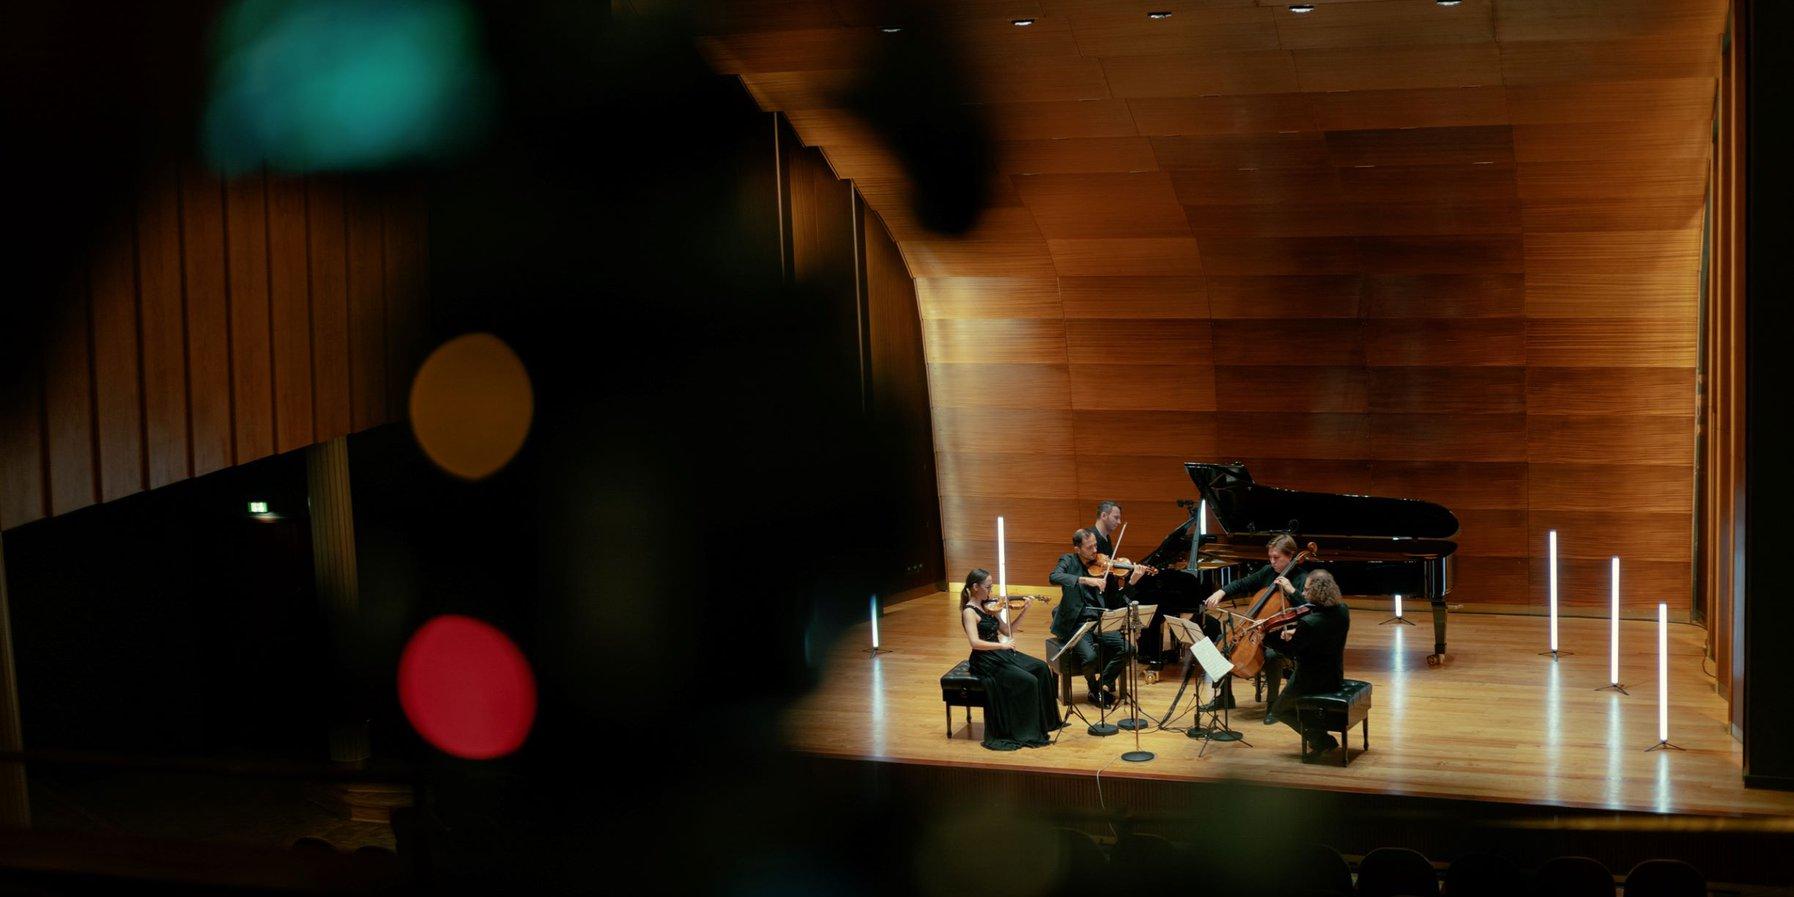 Elbphilharmonie Session in the Laeiszhalle Recital Hall